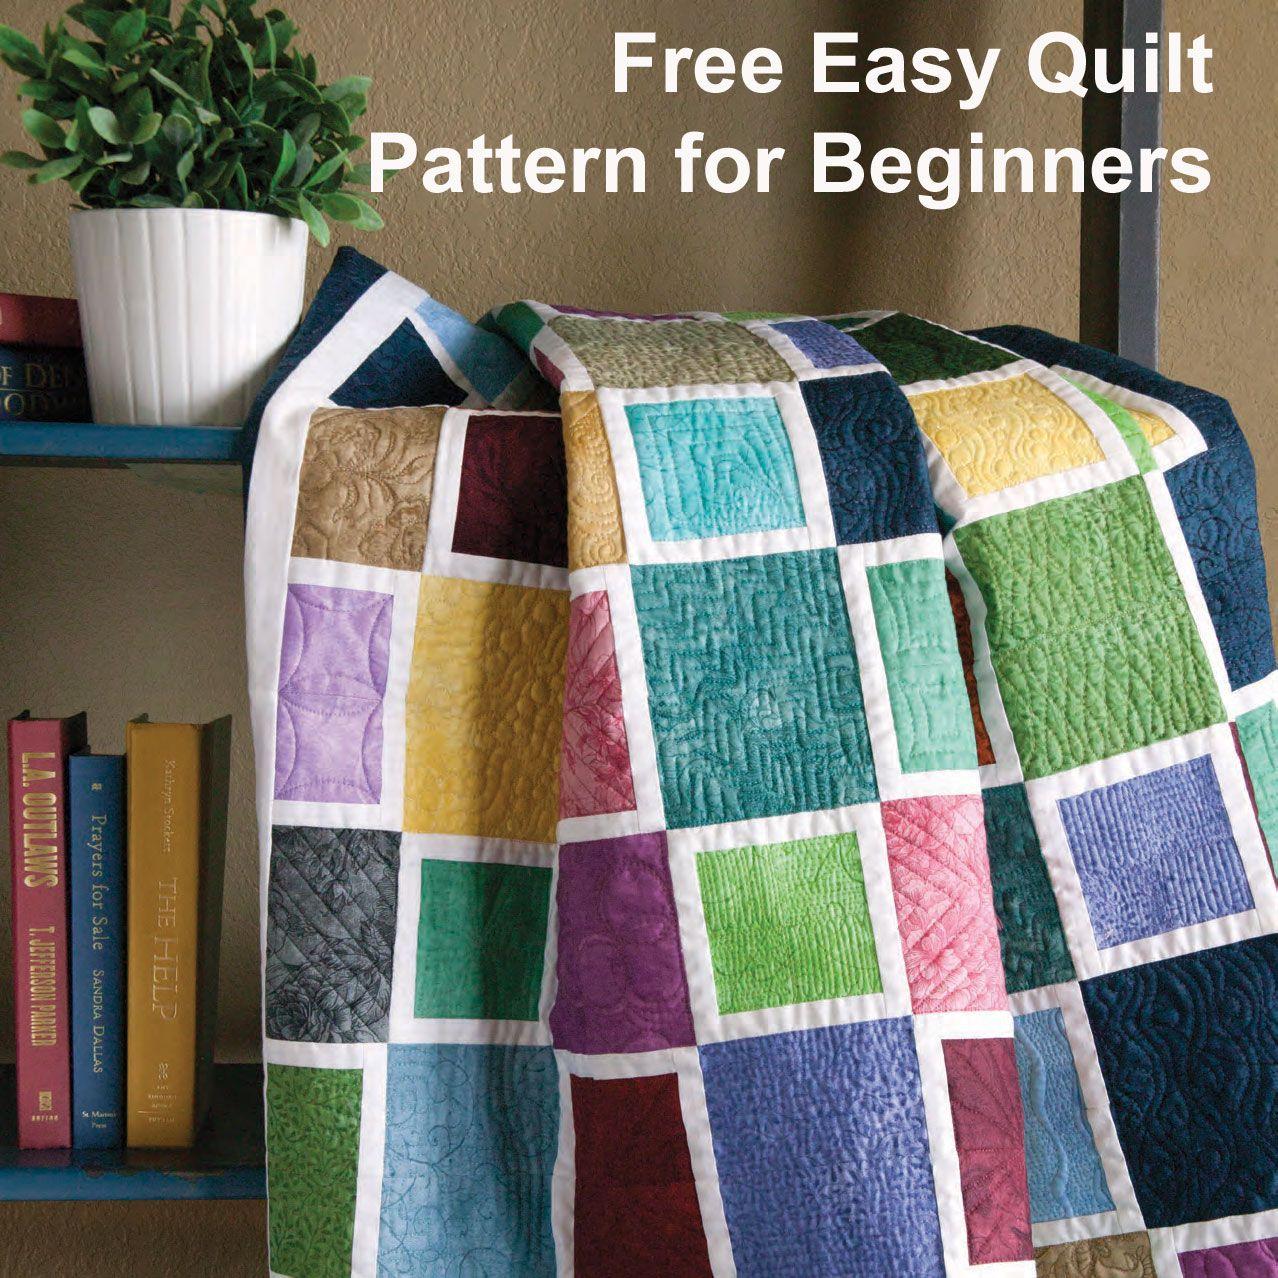 Free Patterns for Beginning Quilting: Mediterranean Mosaic by ... : quilting for beginners free patterns - Adamdwight.com